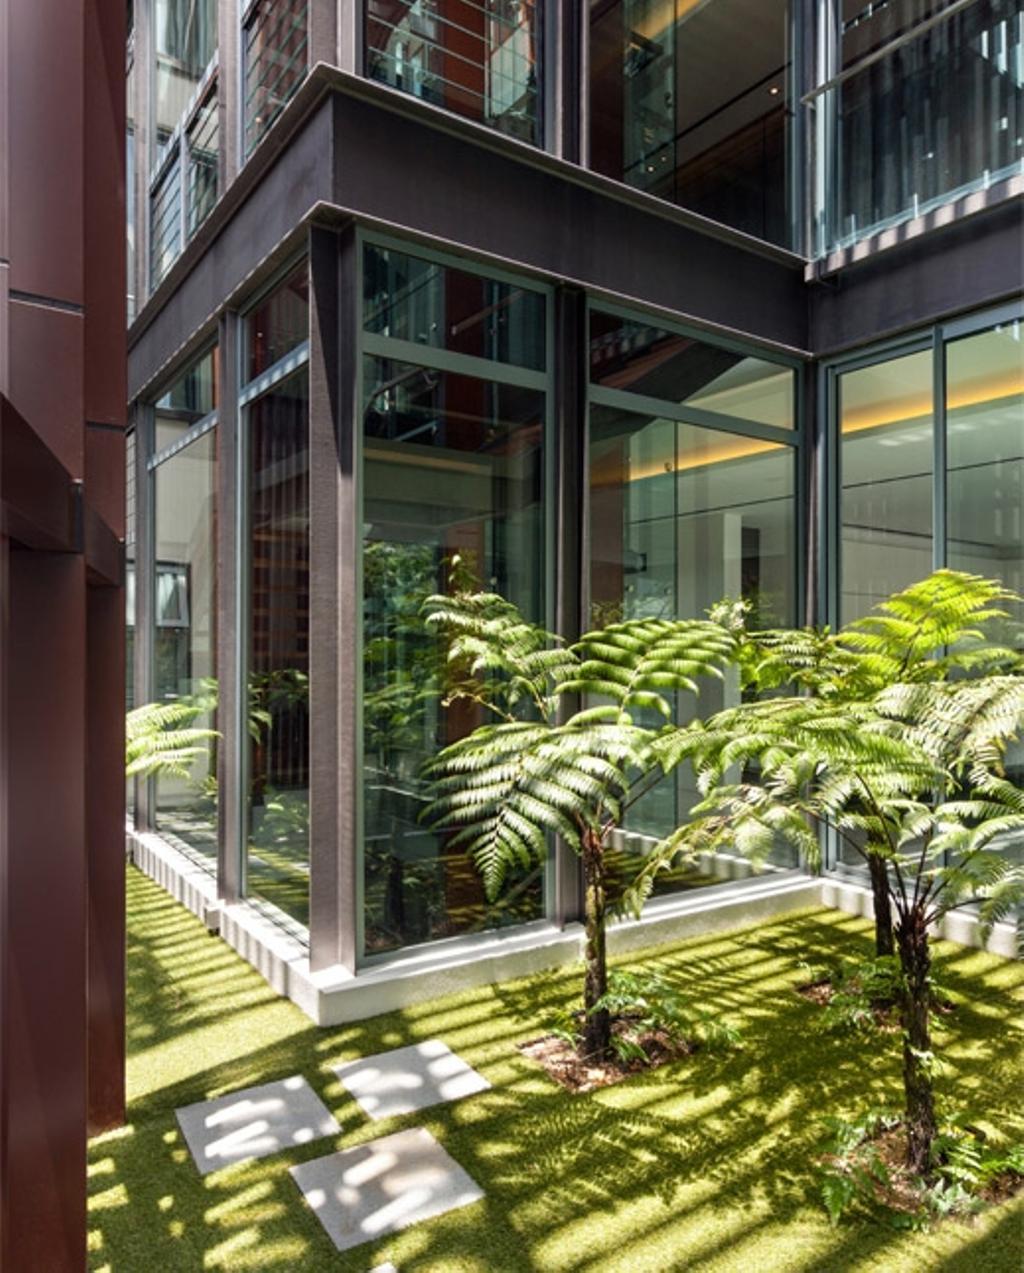 Modern, Landed, Trevose, Architect, Timur Designs, Porch, Arecaceae, Flora, Palm Tree, Plant, Tree, Fern